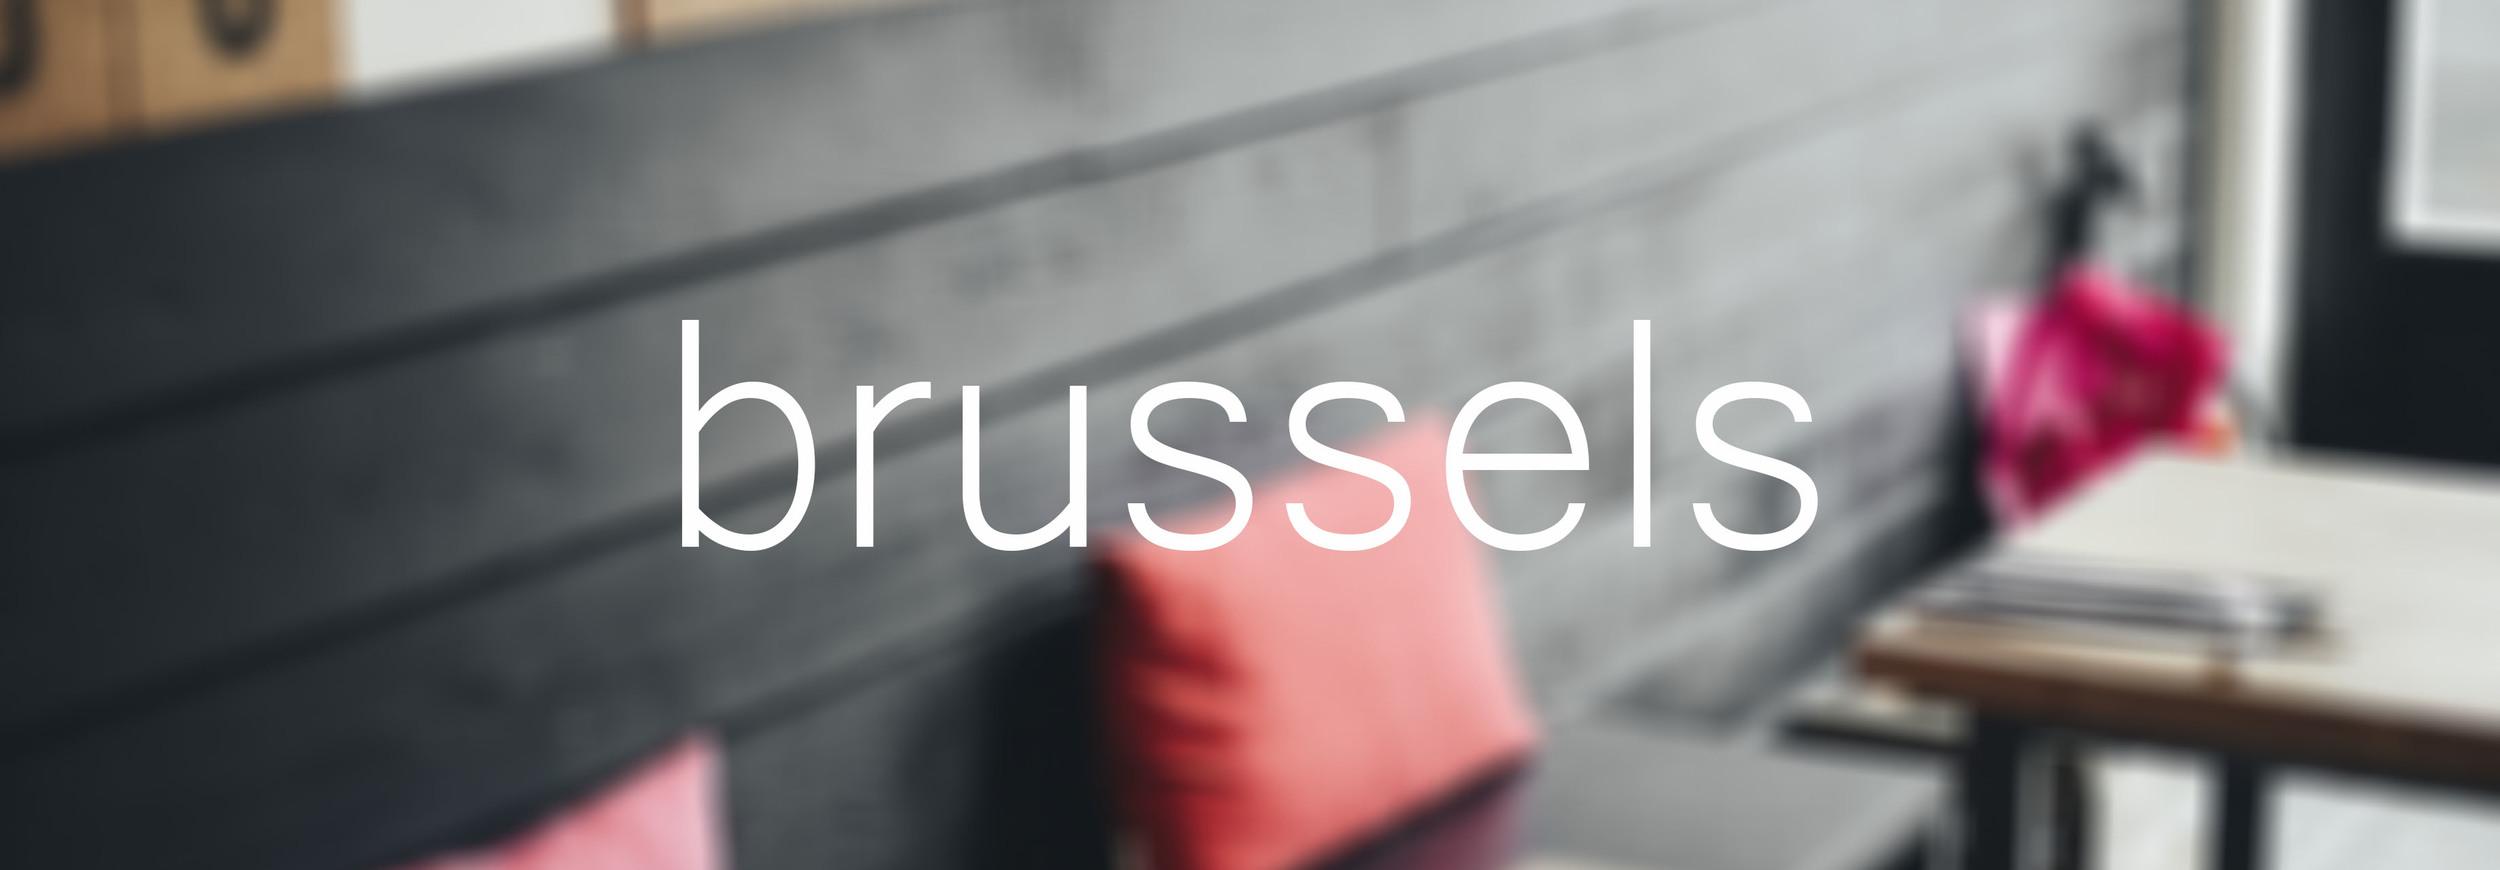 brussels belgium guide best food drink breakfast brunch lunch blogger spots